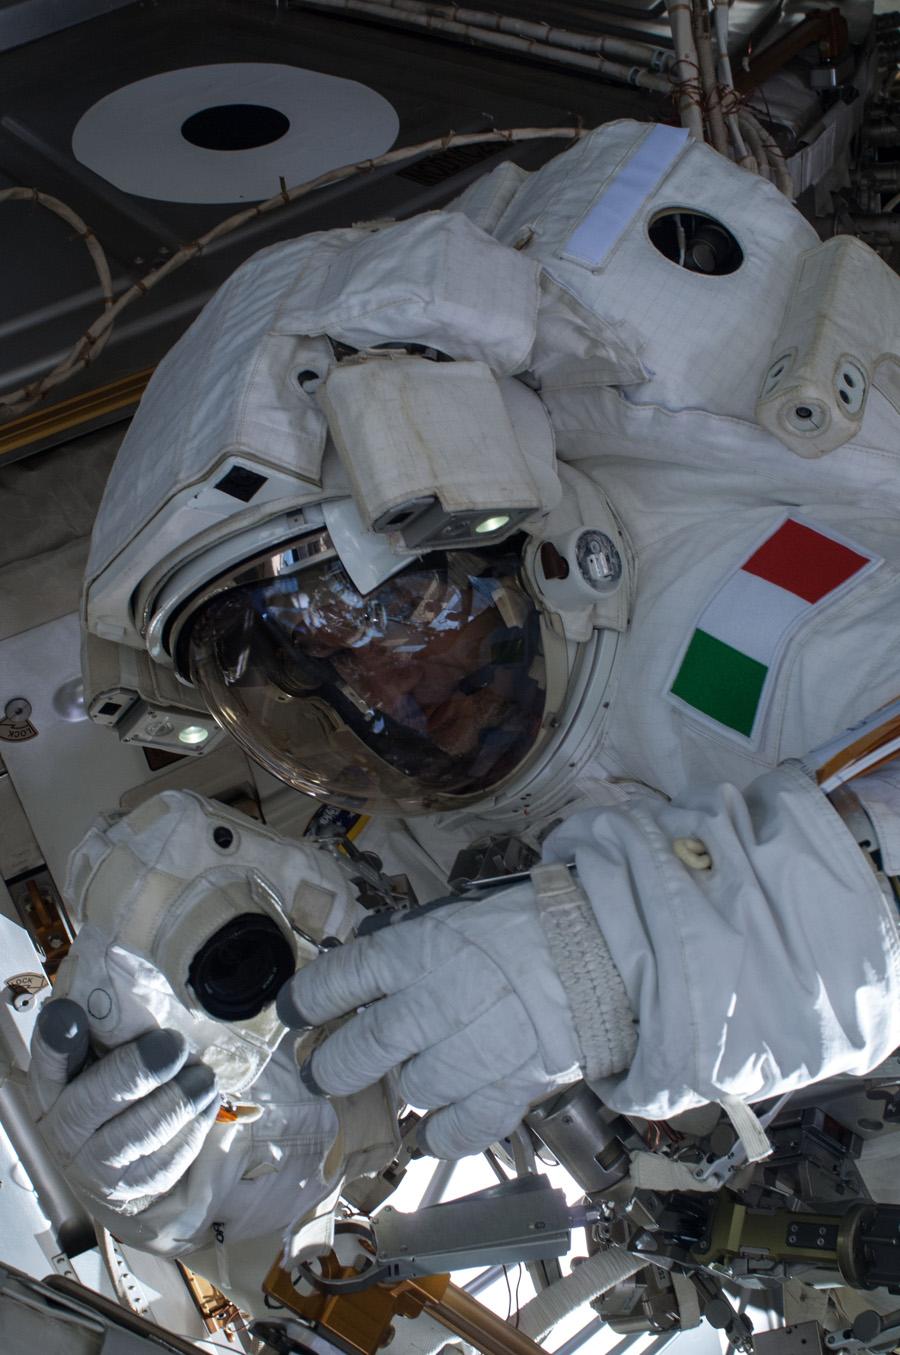 Parmitano Reports Water Floating in Helmet During Spacewalk